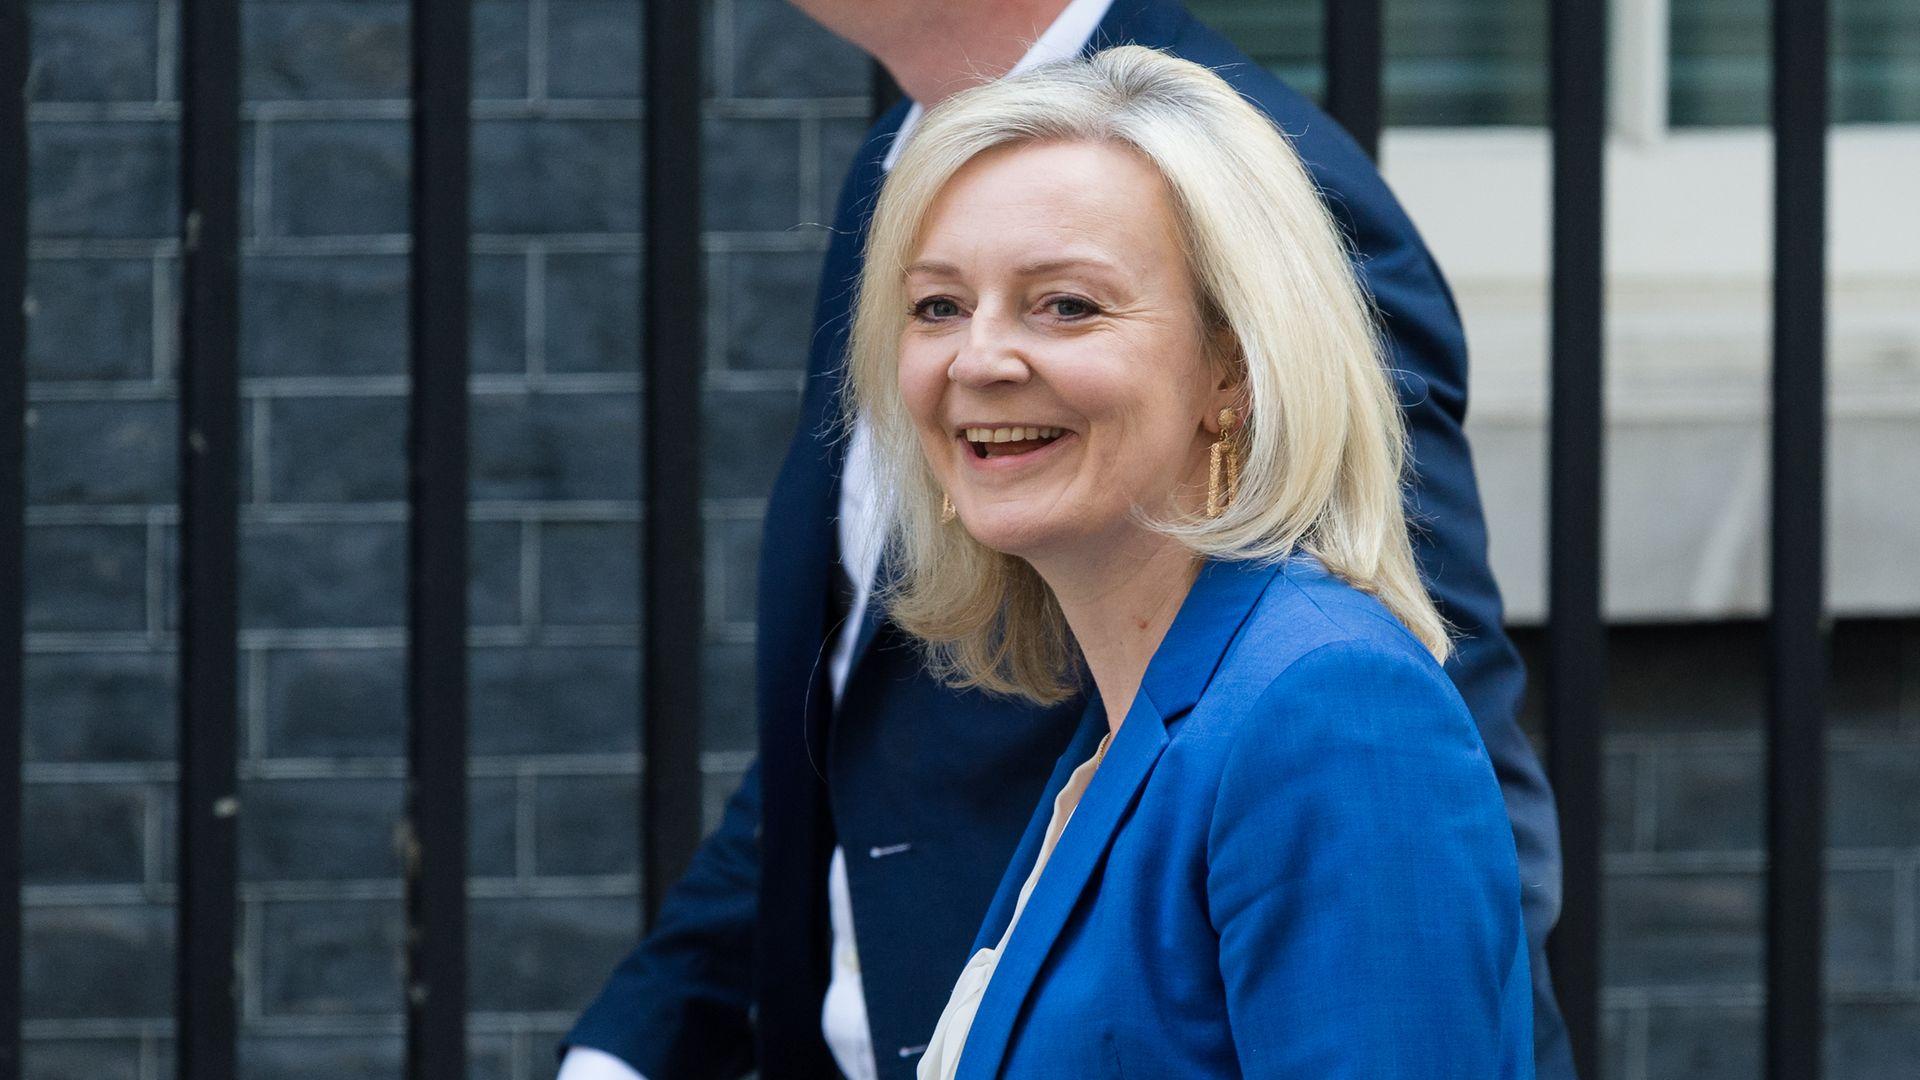 Liz Truss in Downing Street - Credit: Photo credit should read Wiktor Szymanowicz/Barcroft Media via Getty Images